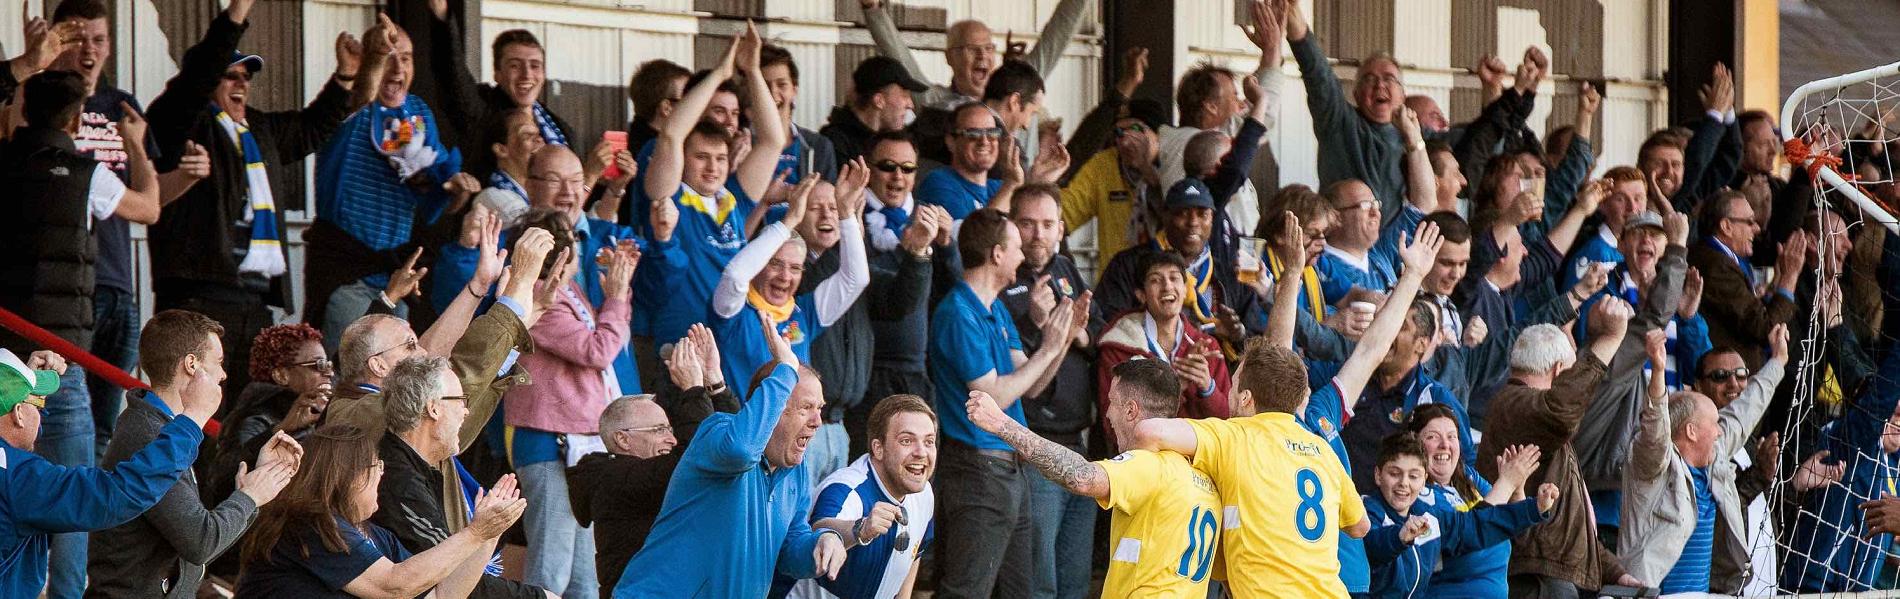 Wealdstone FC Supporters' Club